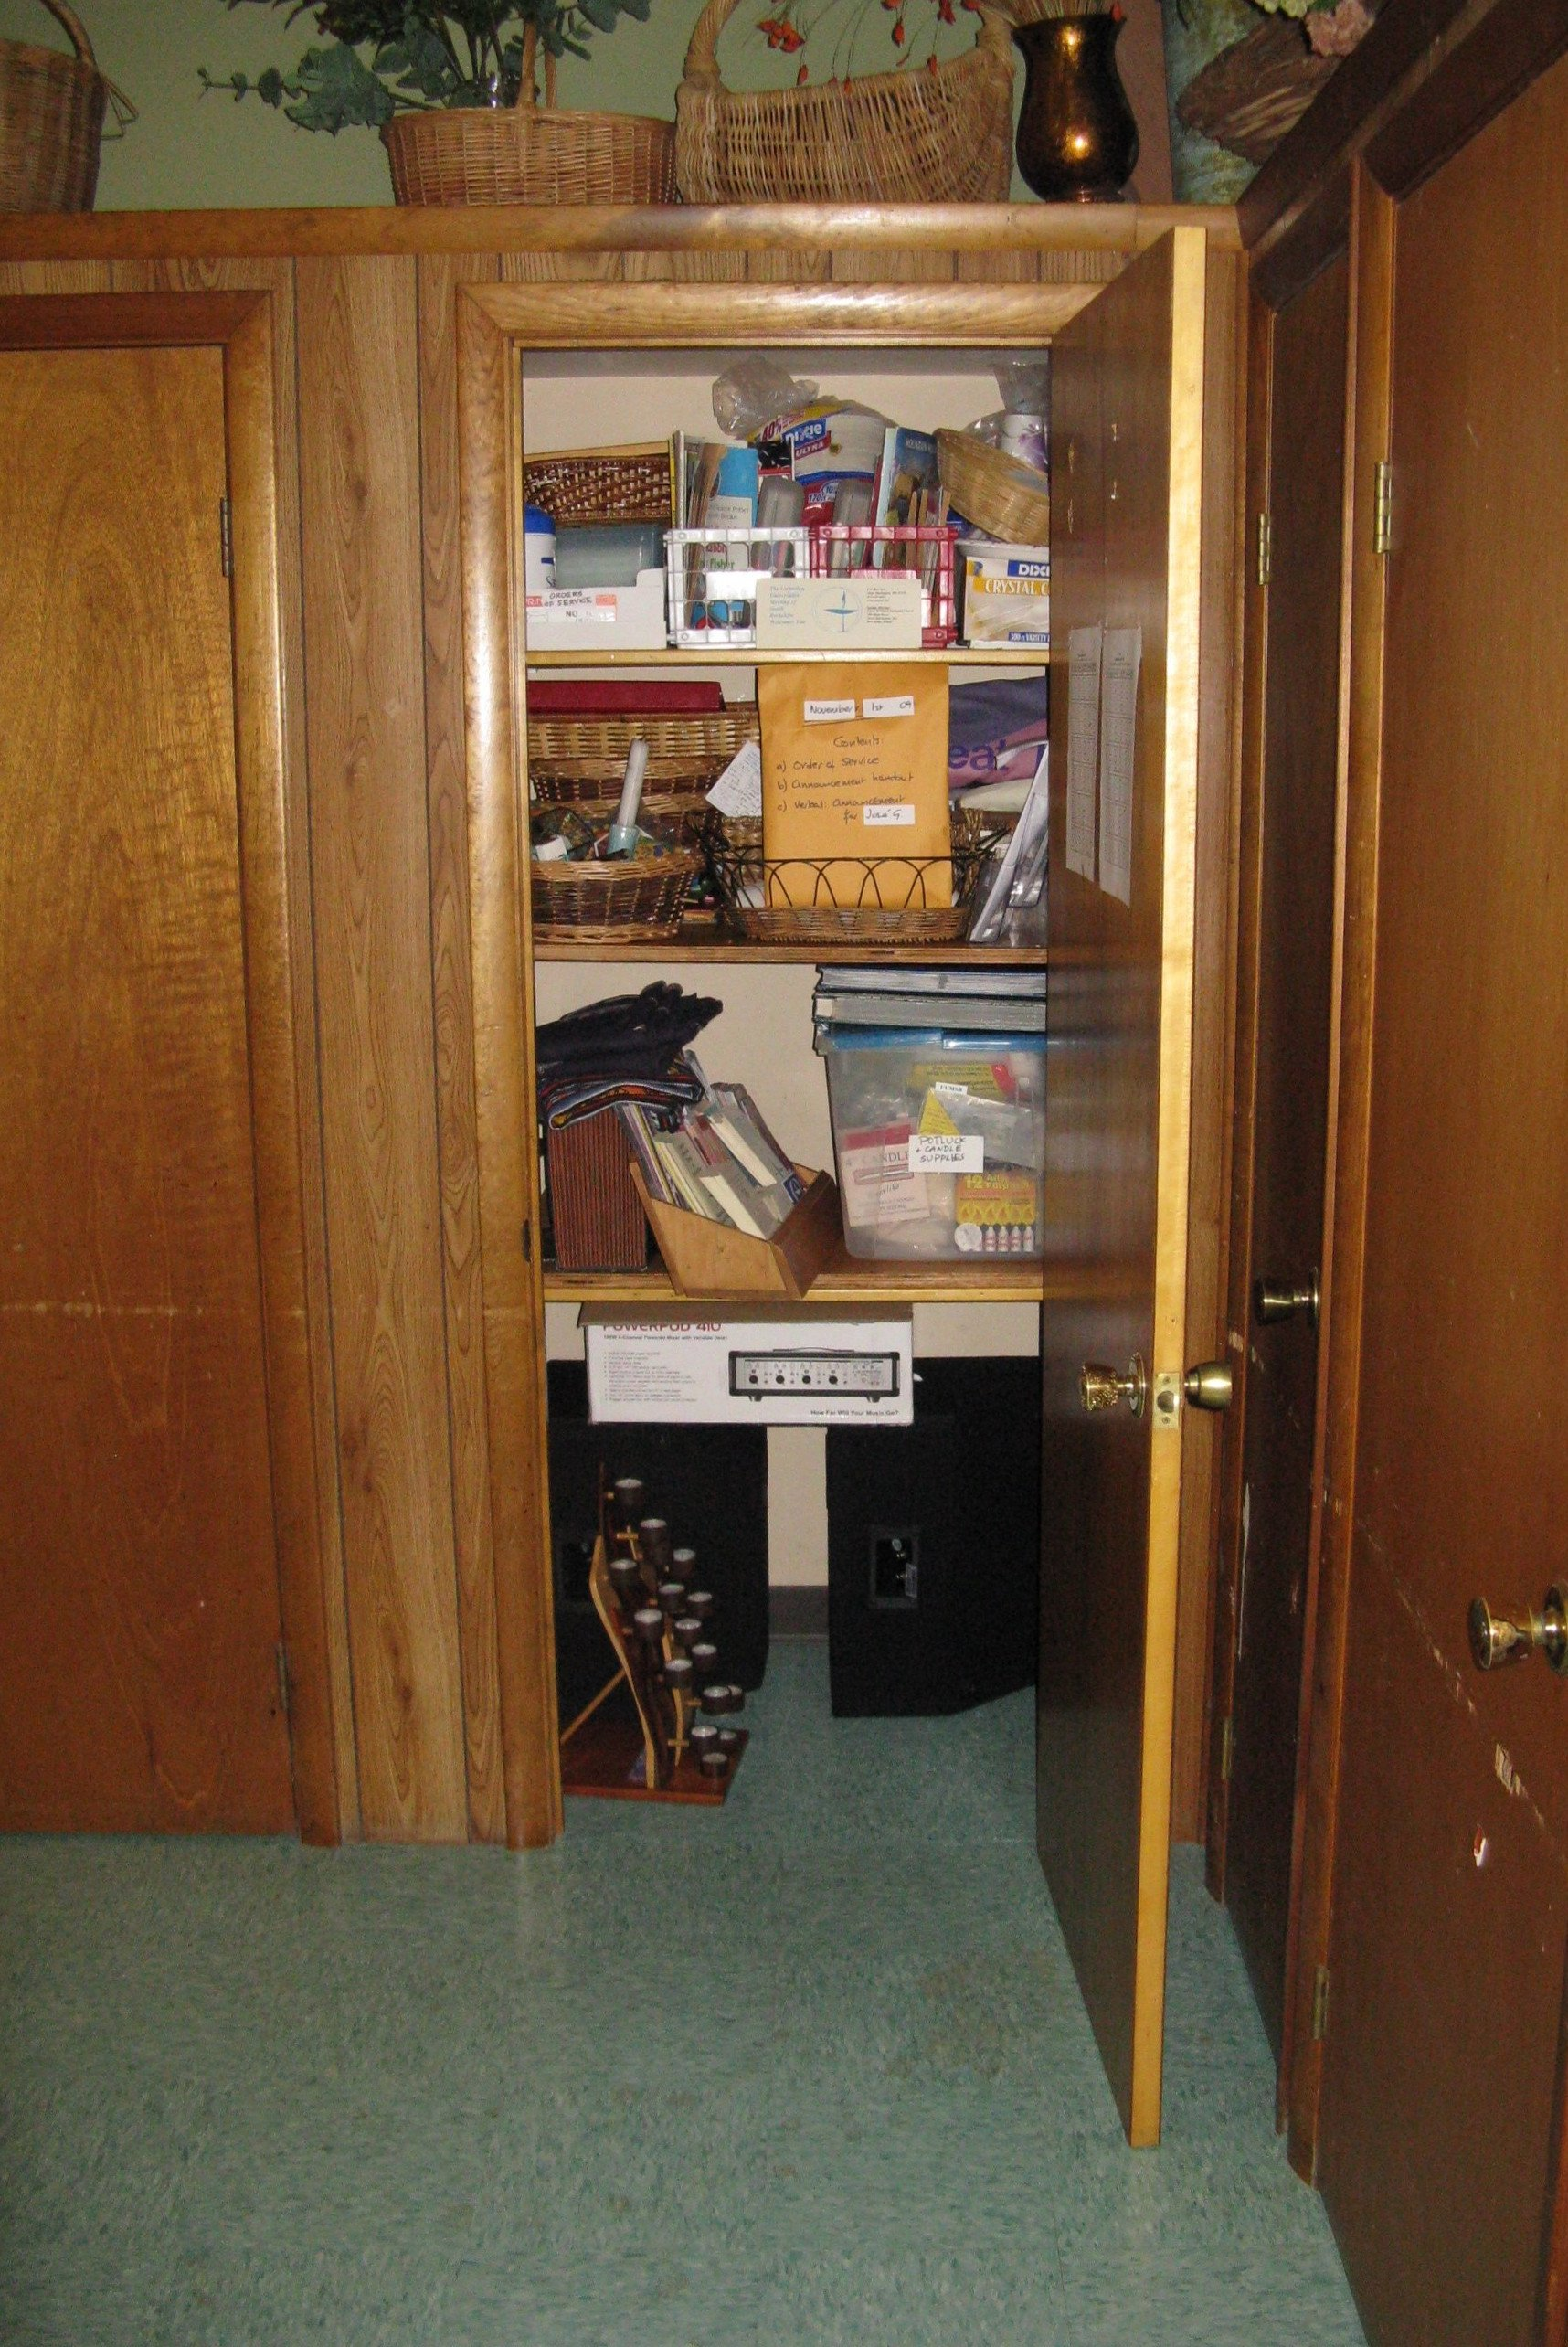 File:The Unitarian Universalist Meeting Of South Berkshire, Closet, Great  Barrington MA.